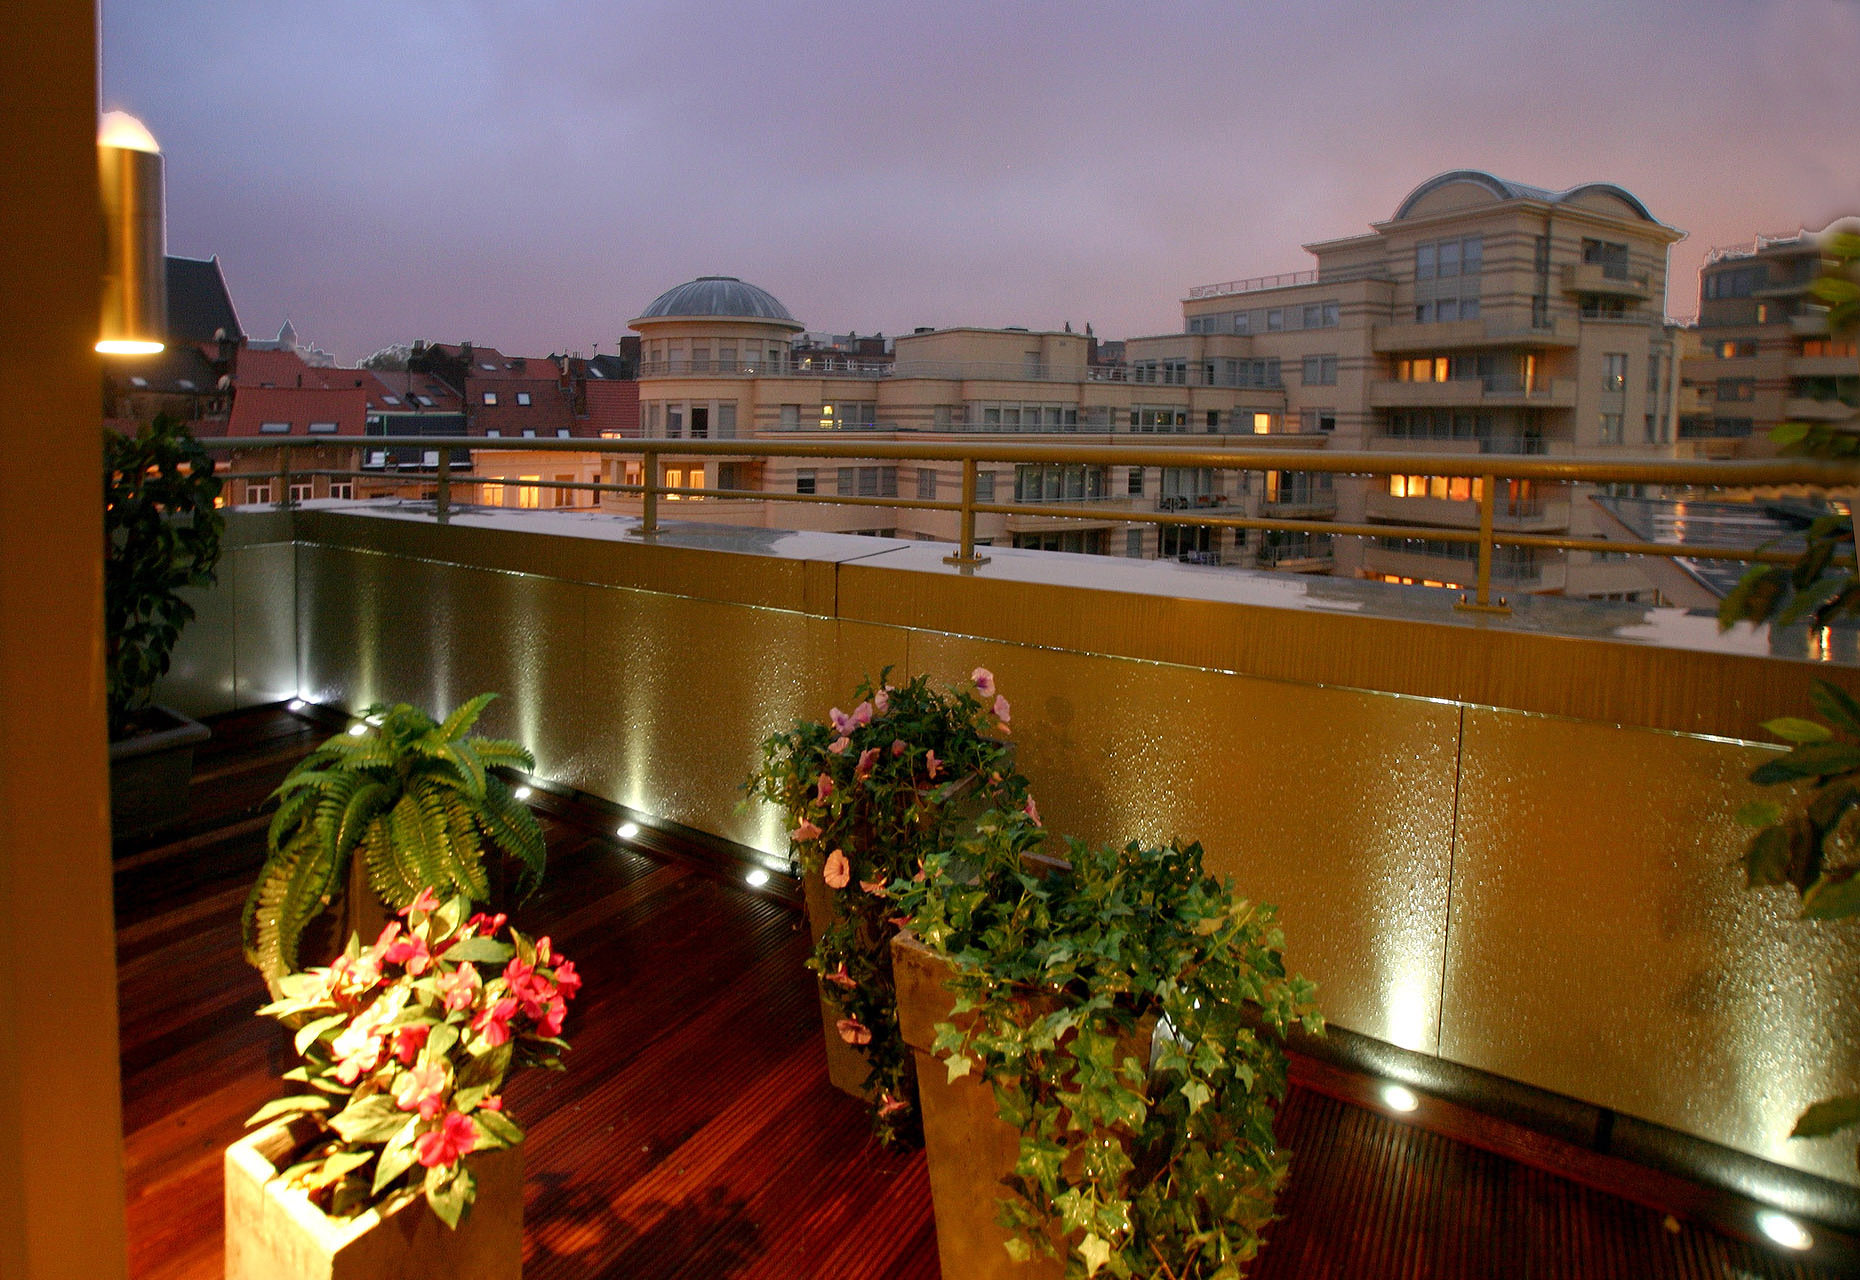 Penthouse in Brüssel neben EU Parlement - Marcotte Style